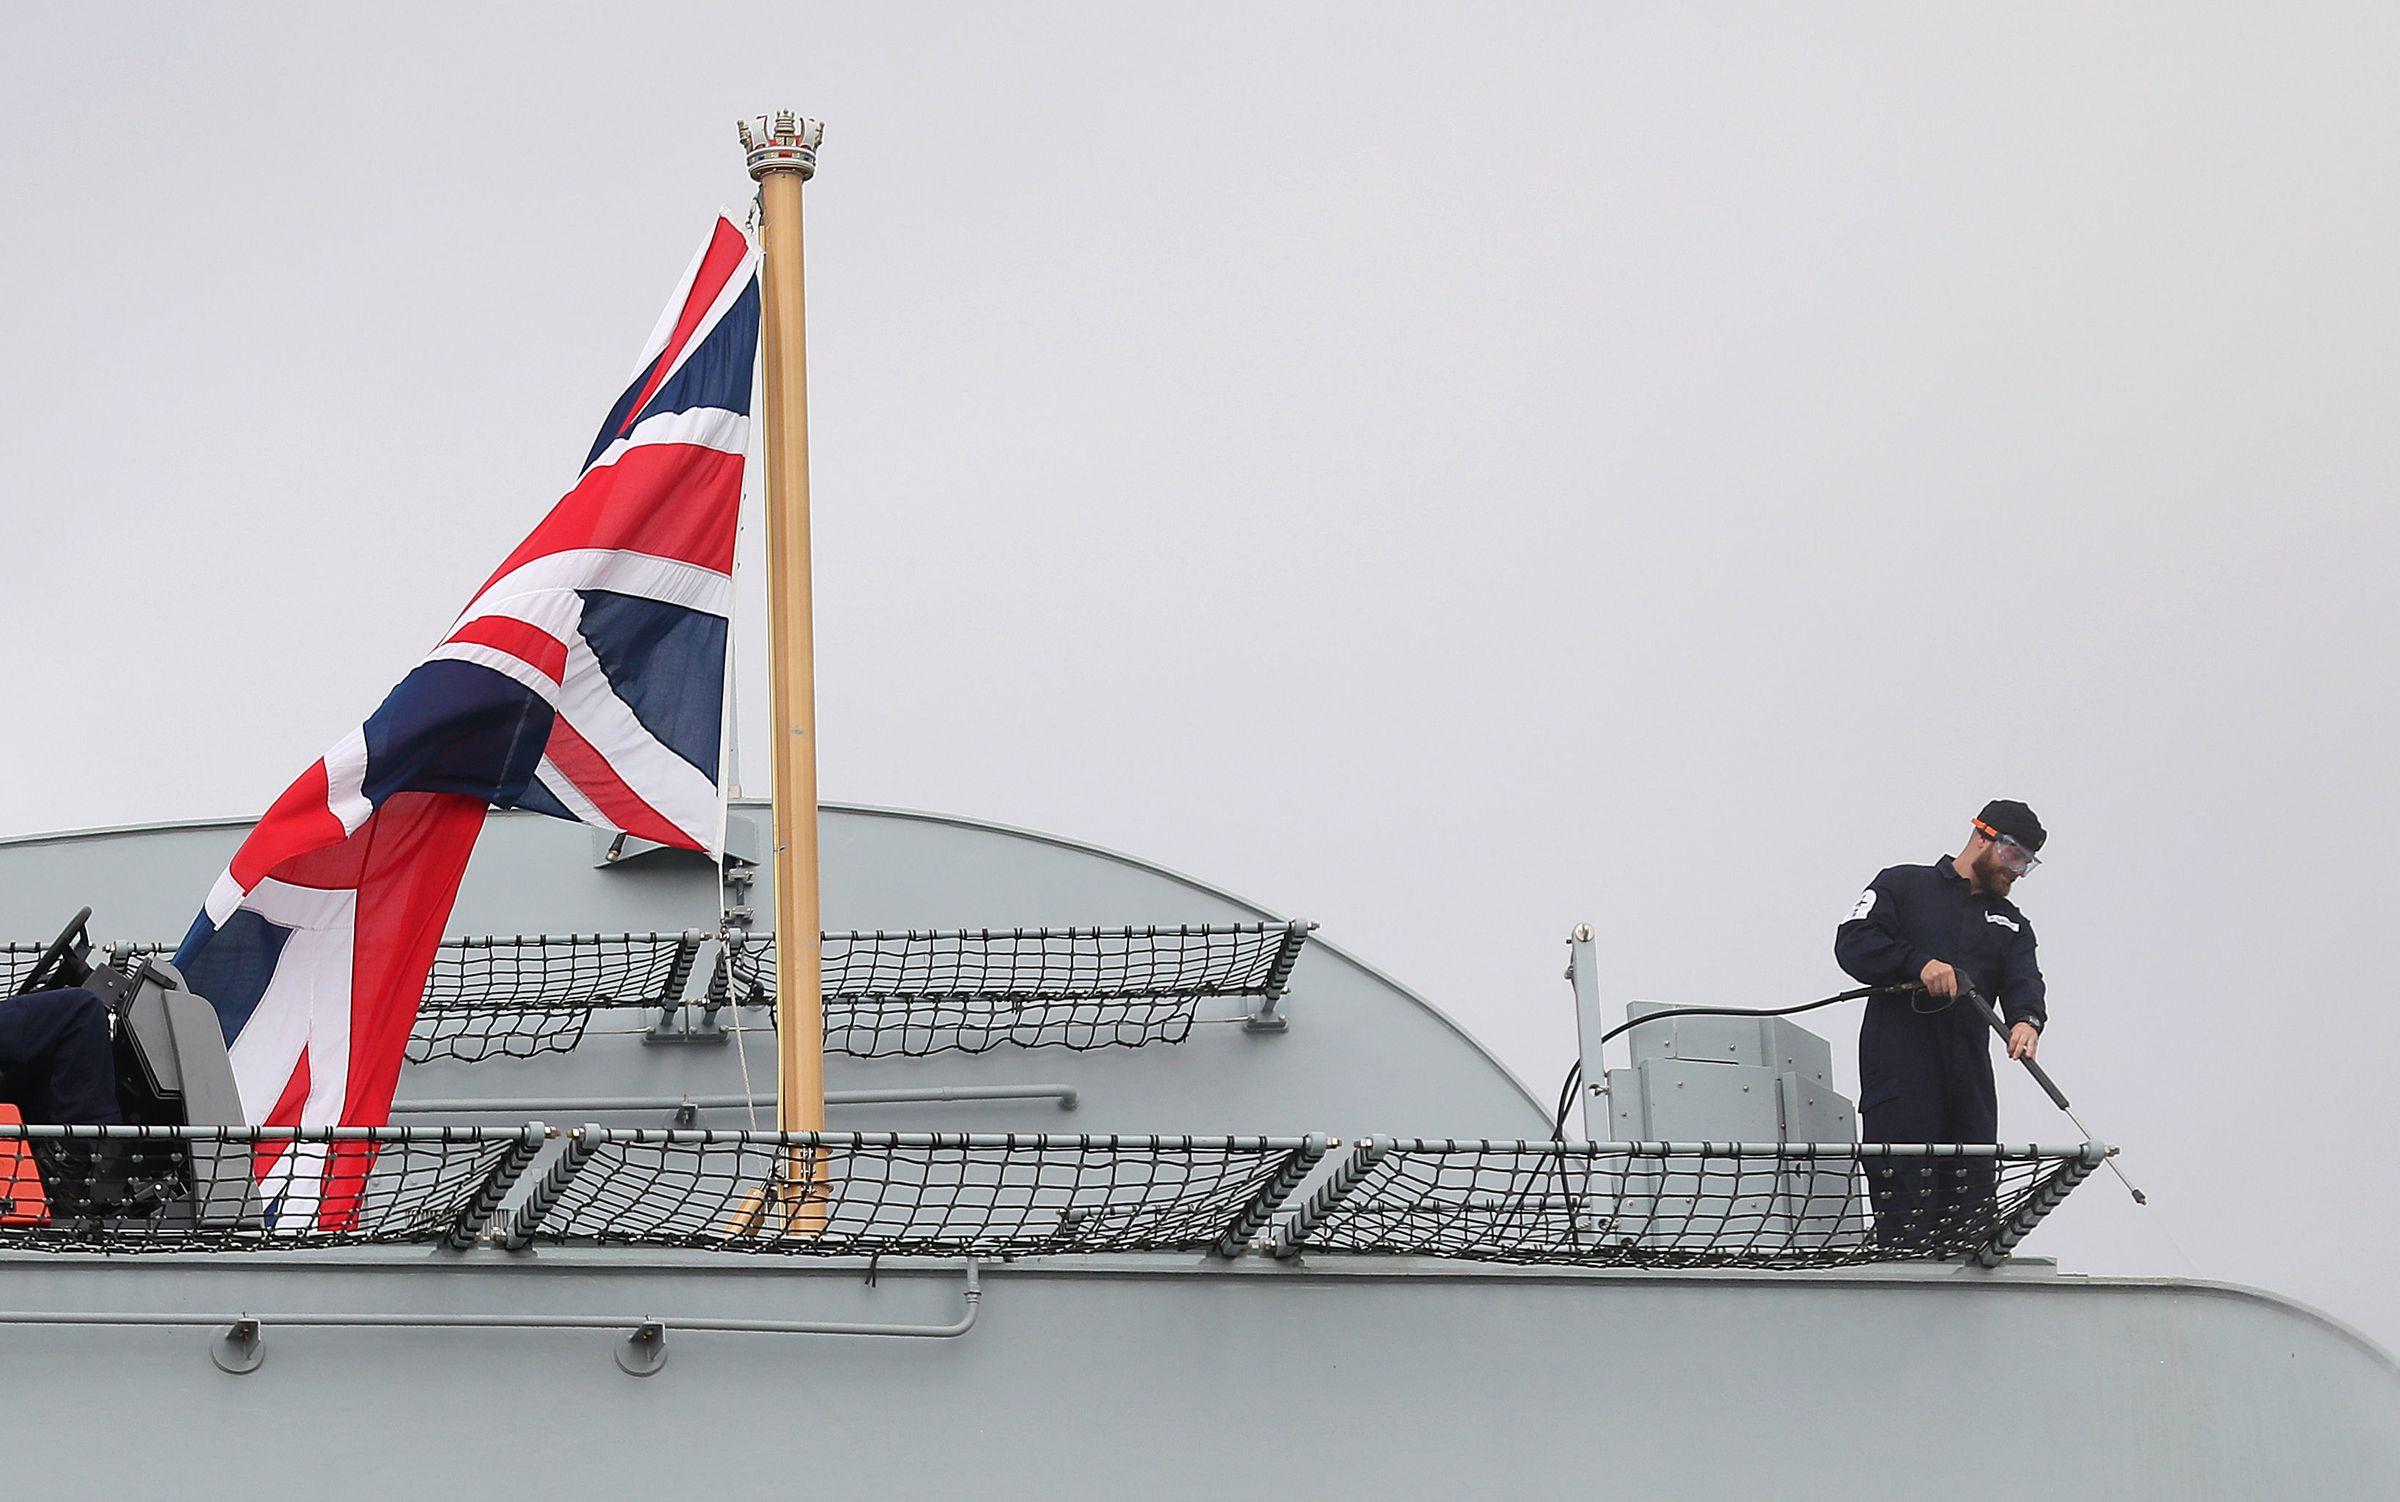 "<p>Авианосец ""Королева Елизавета"" ВМС Великобритании. Фото © PA Wire / PA Images</p>"